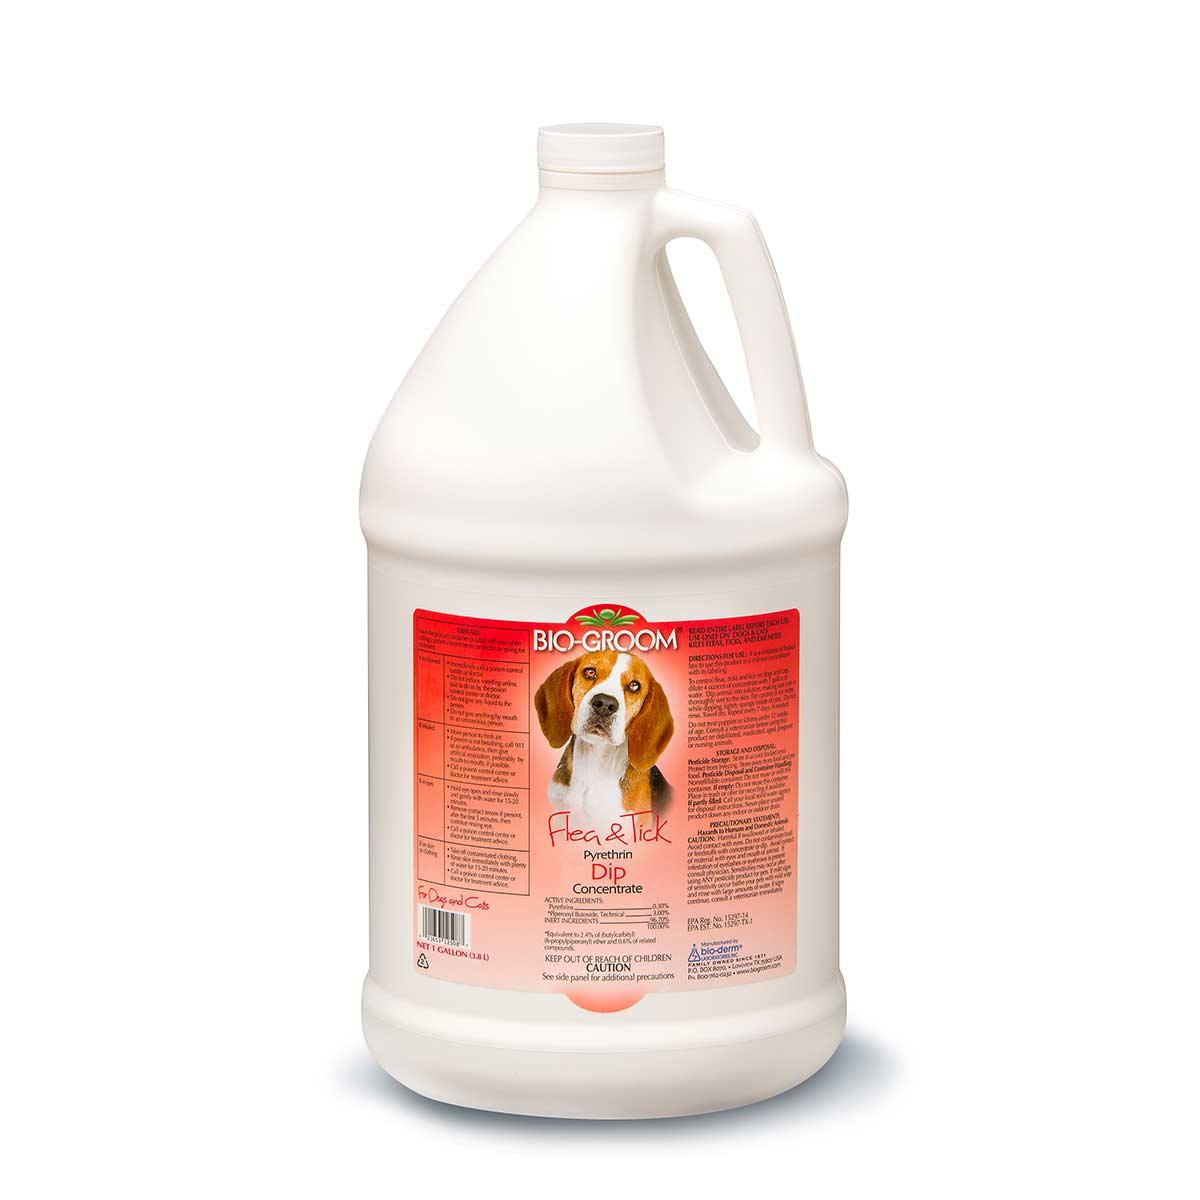 Gallon Bio-Groom Flea and Tick Pyrethrin Dip